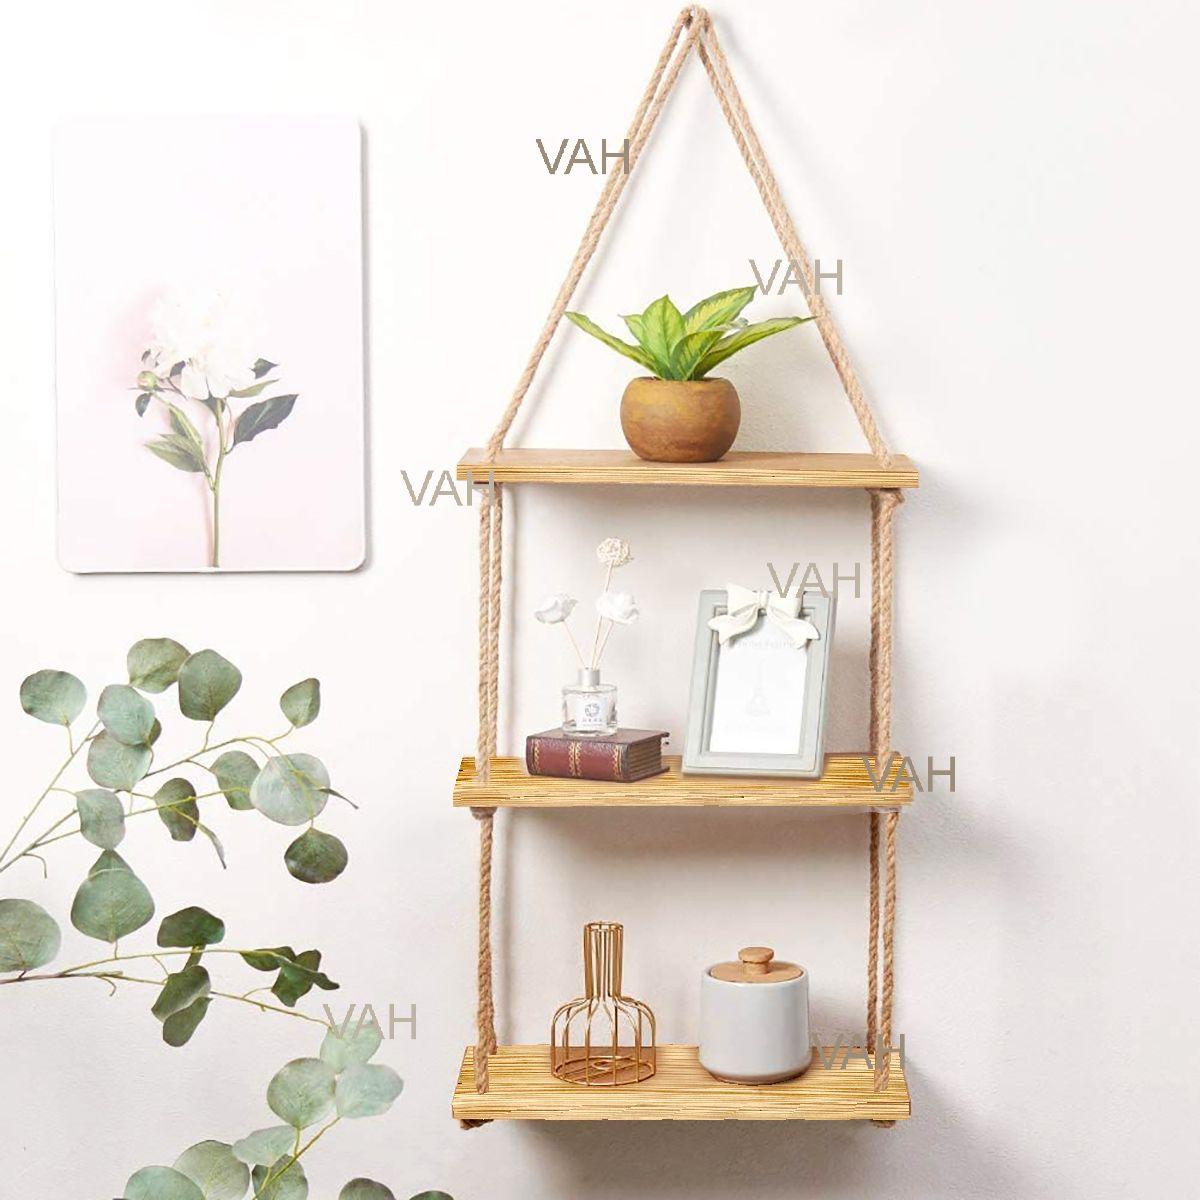 VAH Wall Hanging Shelf, Real pine Wood Floating Shelves for Wall Rustic Rope Shelves Plant Shelf Farmhouse Decor for Li